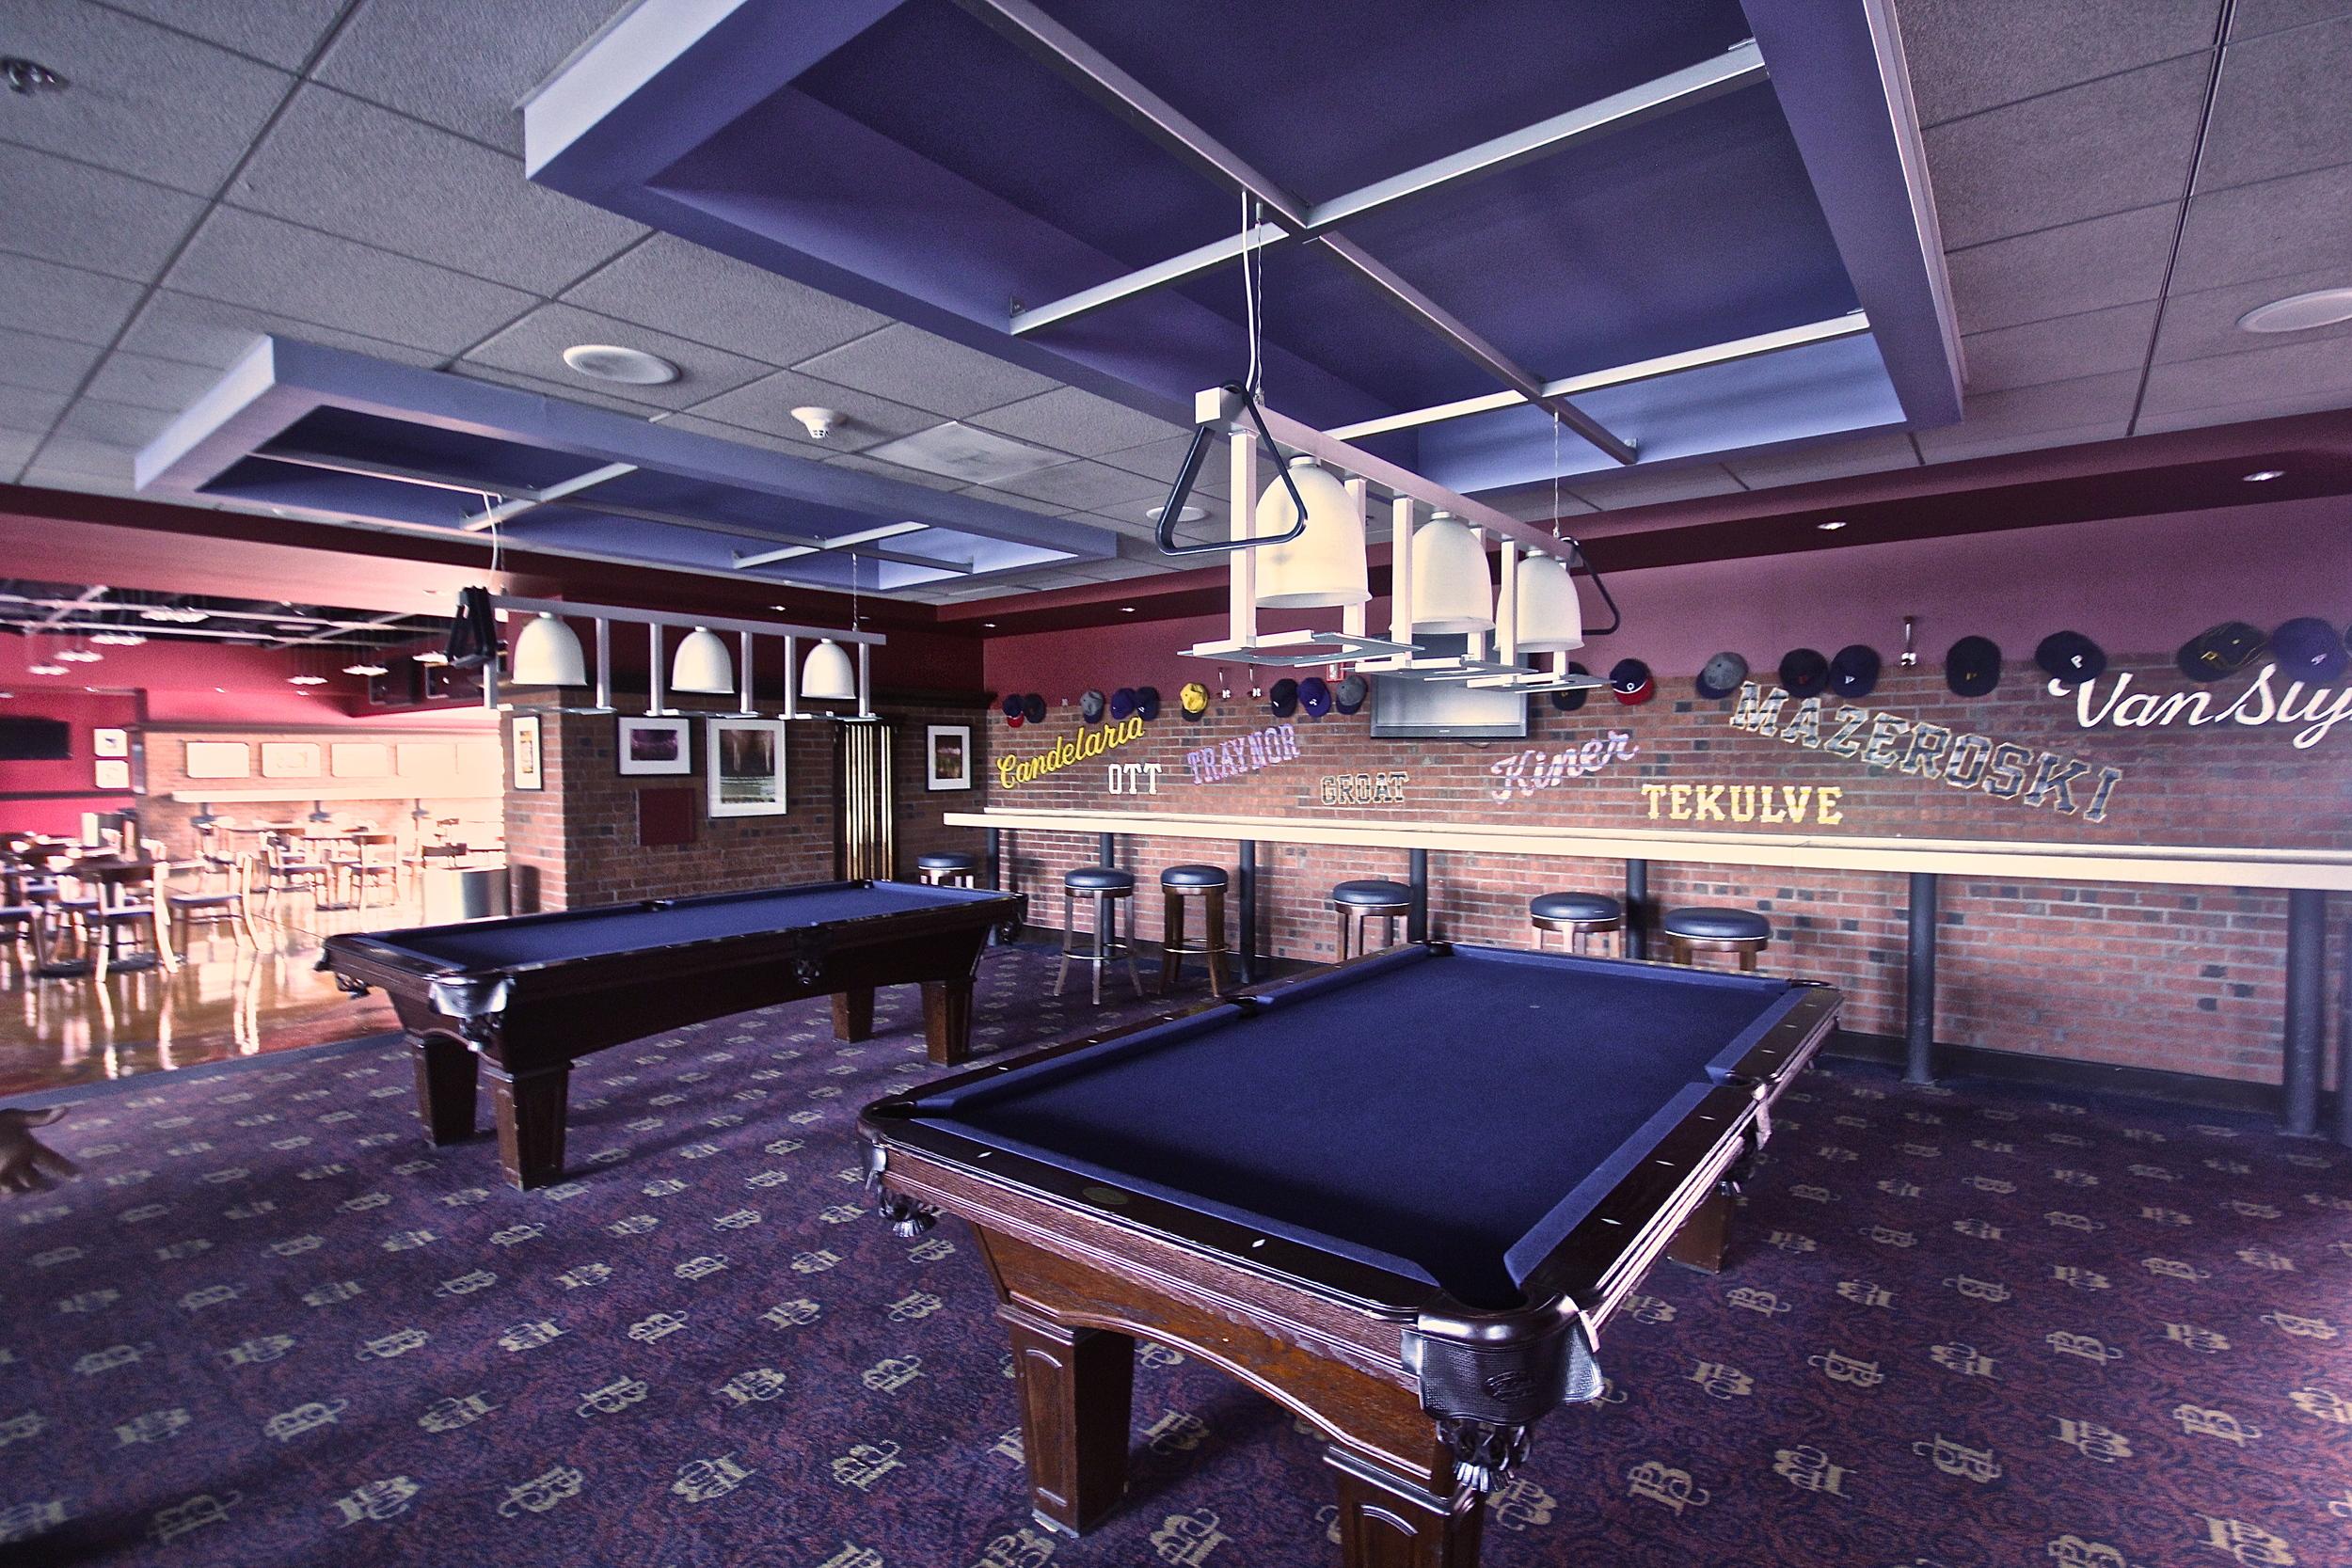 Pool tables on club level.JPG